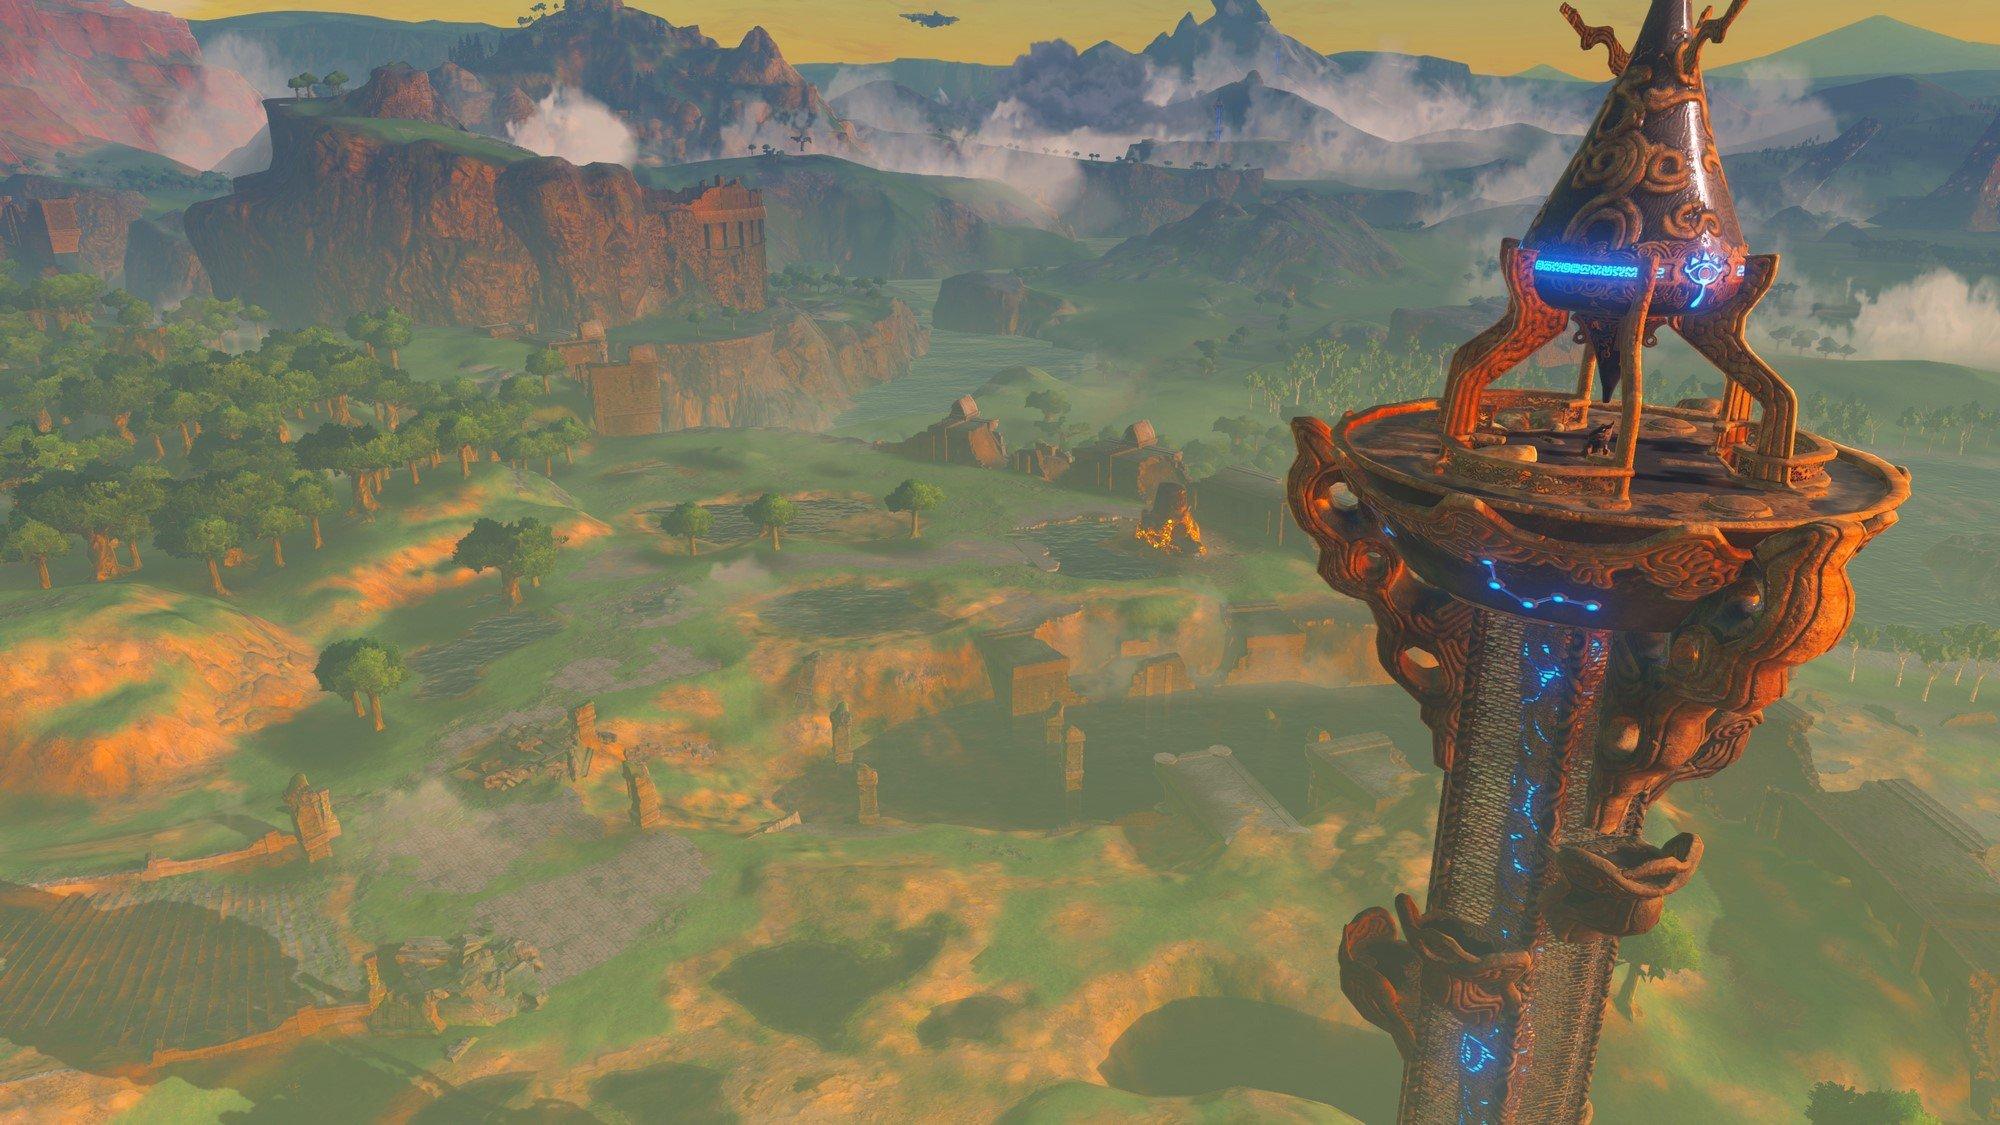 Breath Of The Wild Walkthrough Great Plateau Zelda Dungeon